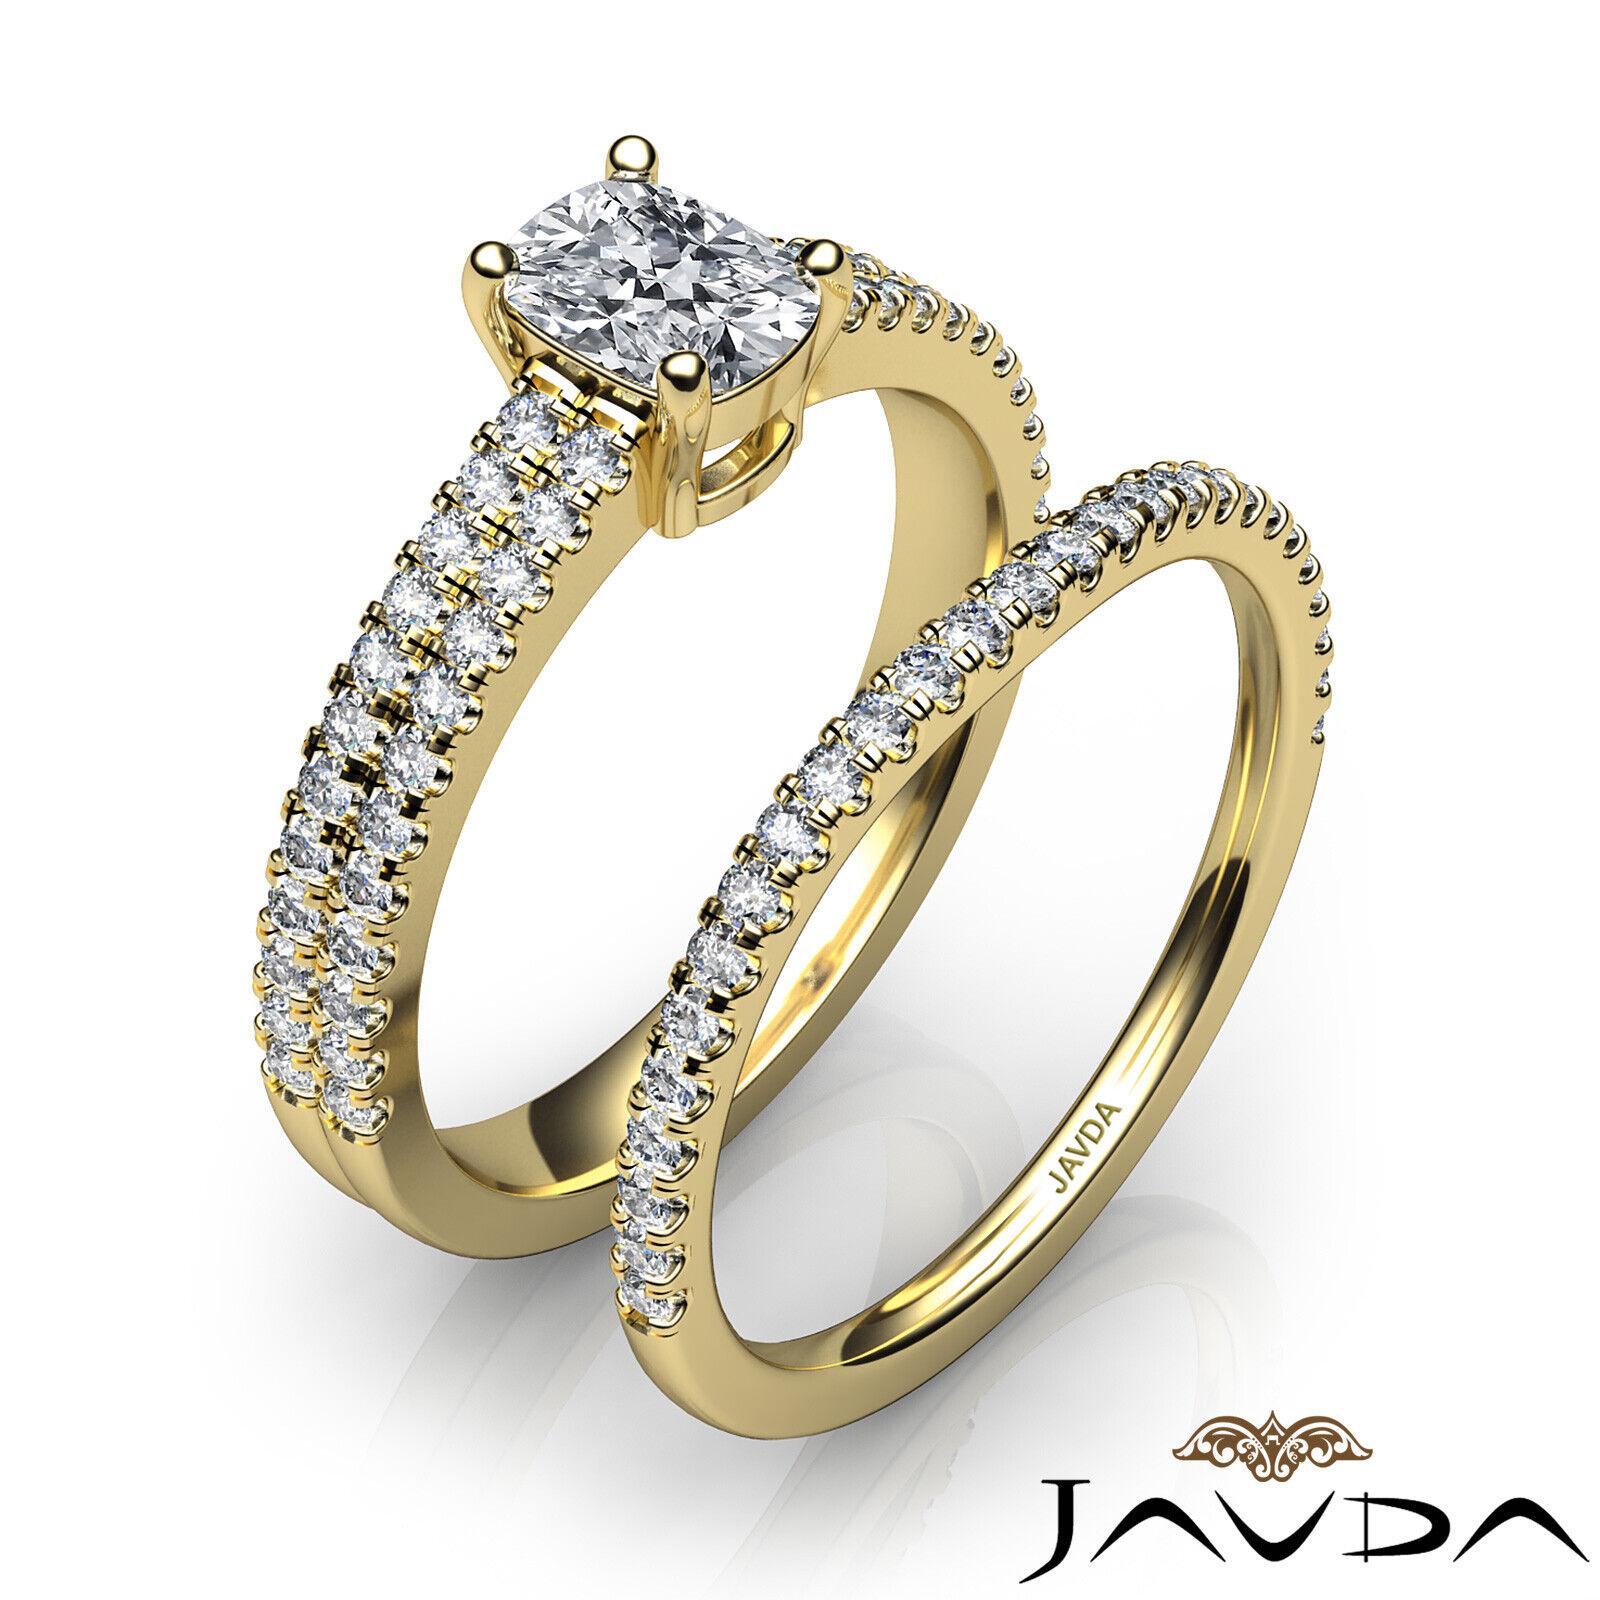 1.8ctw Bridal Scalloped Pave Cushion Diamond Engagement Ring GIA F-VVS2 W Gold 10